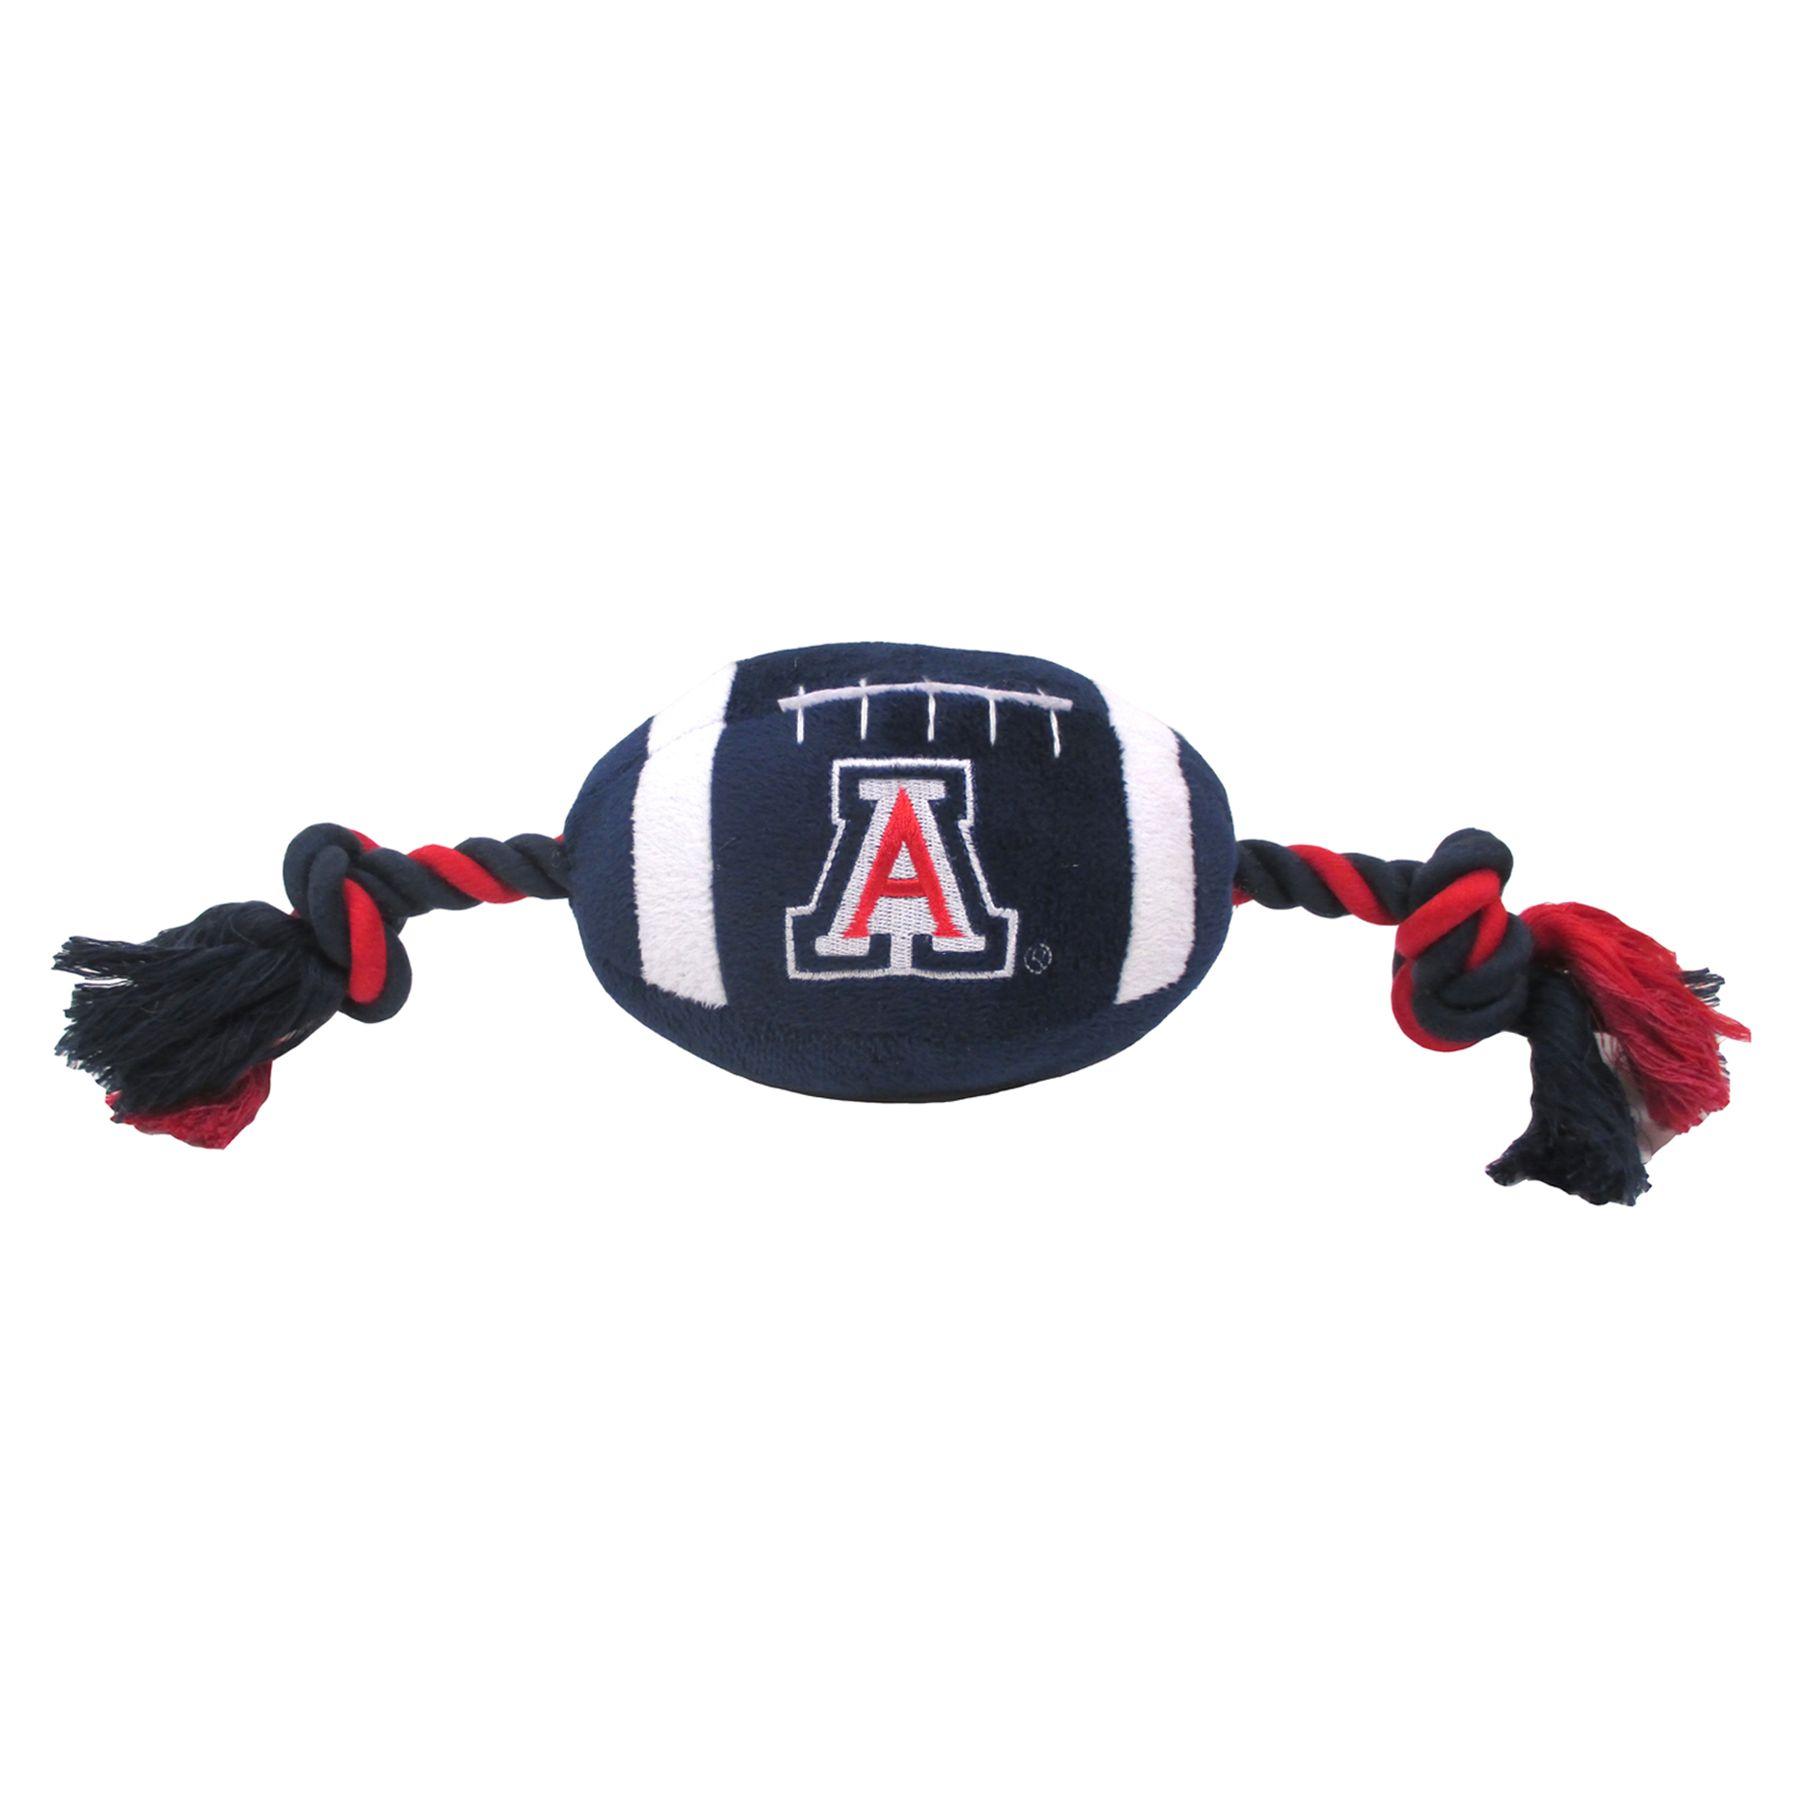 University of Arizona Wildcats Ncaa Football Dog Toy 5242468